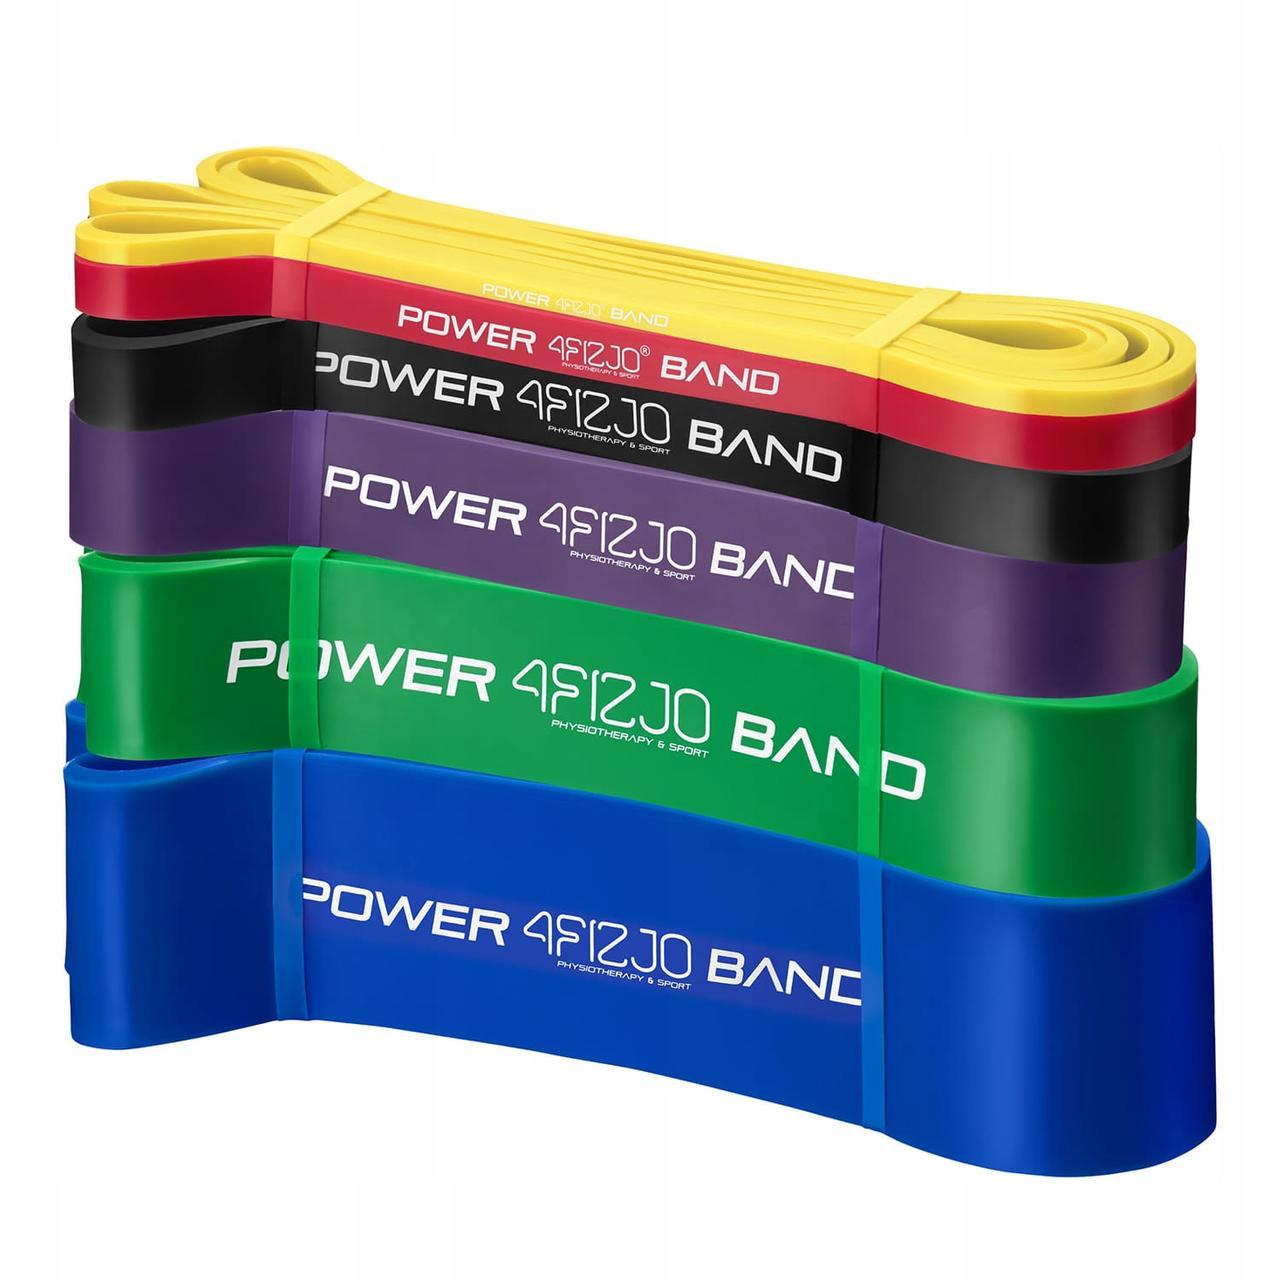 Эспандер-петля (резинка для фитнеса и спорта) 4FIZJO Power Band 6 шт 2-46 кг 4FJ0064